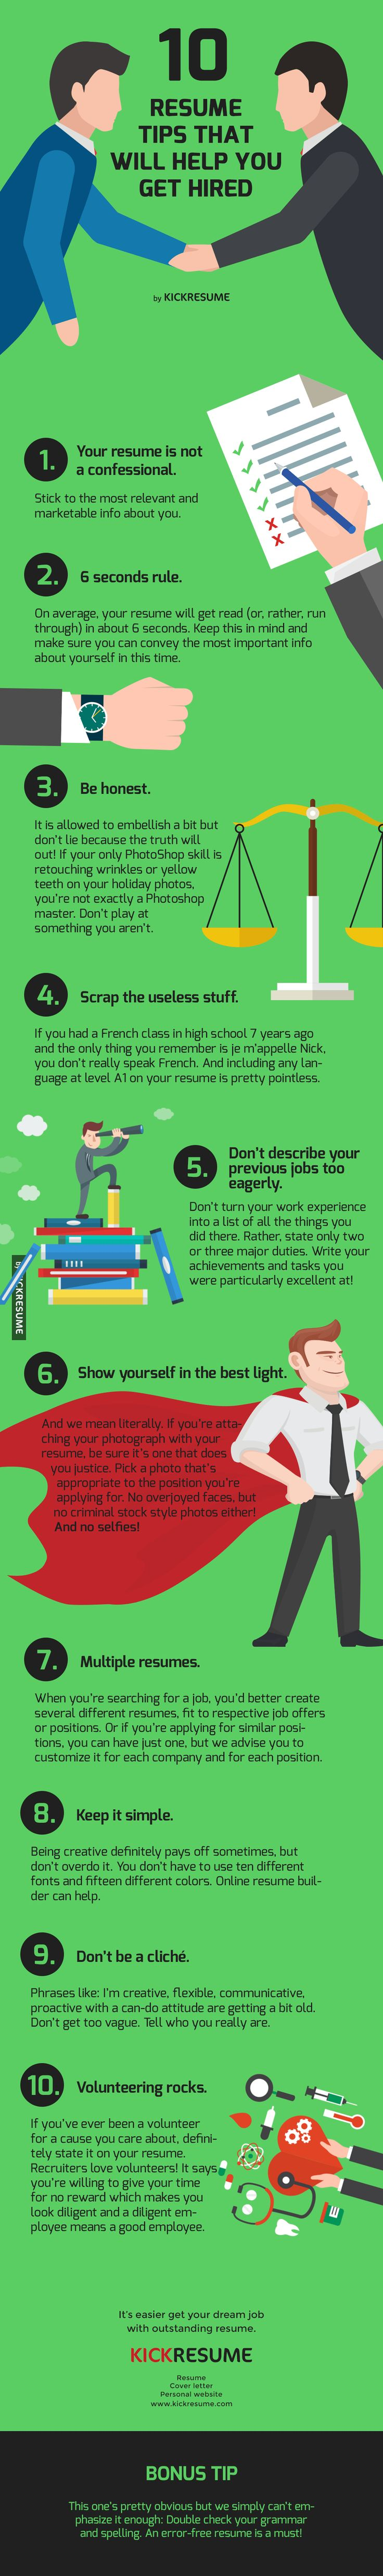 25 best ideas about resume tips on pinterest resume ideas